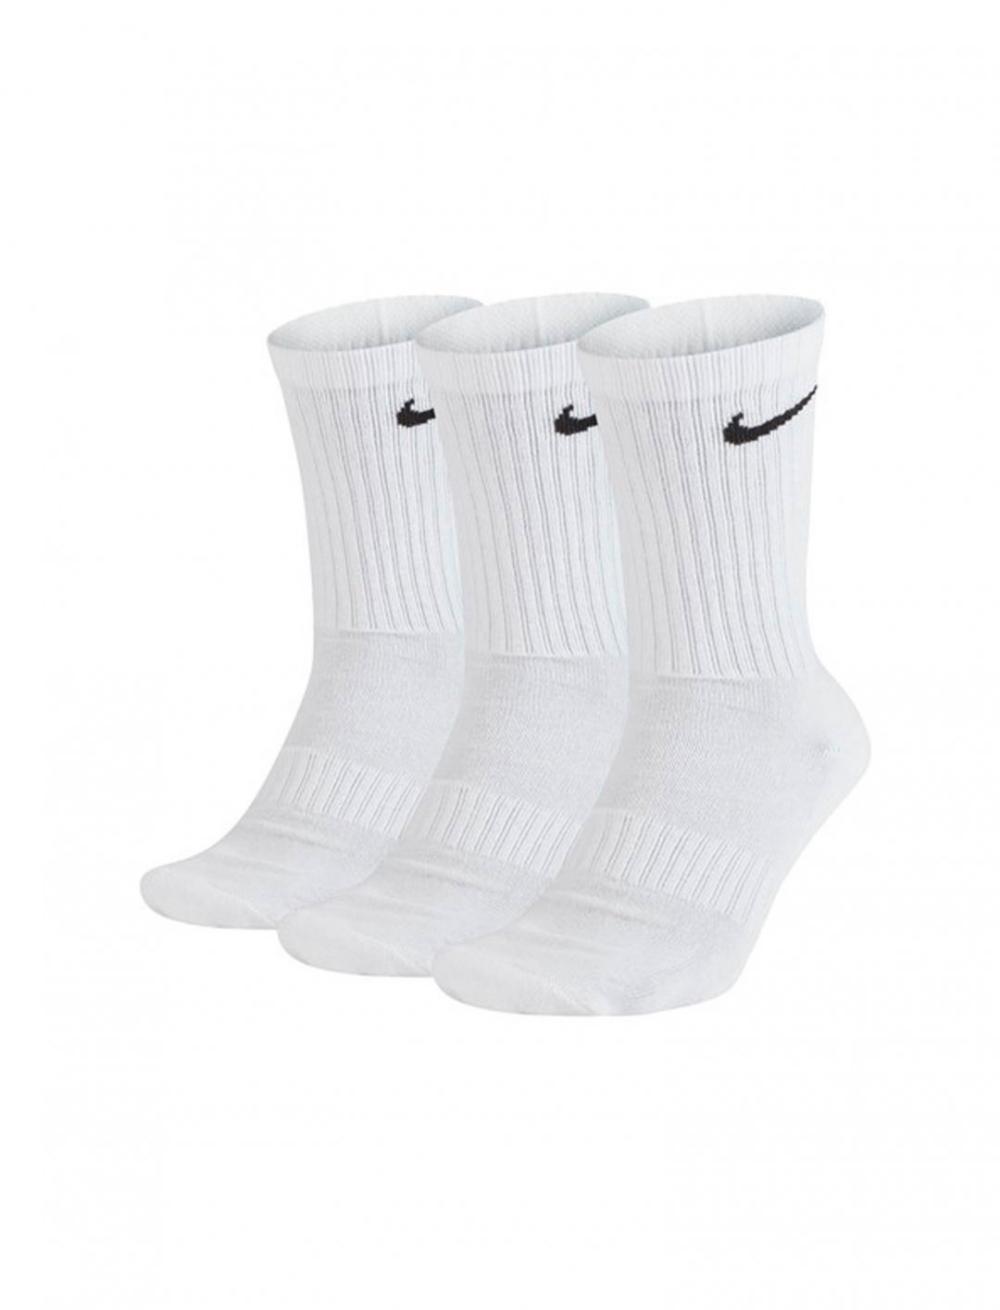 Ruel Cotton Socks White Nike Post Kulture White Nike Socks Cotton Socks Socks